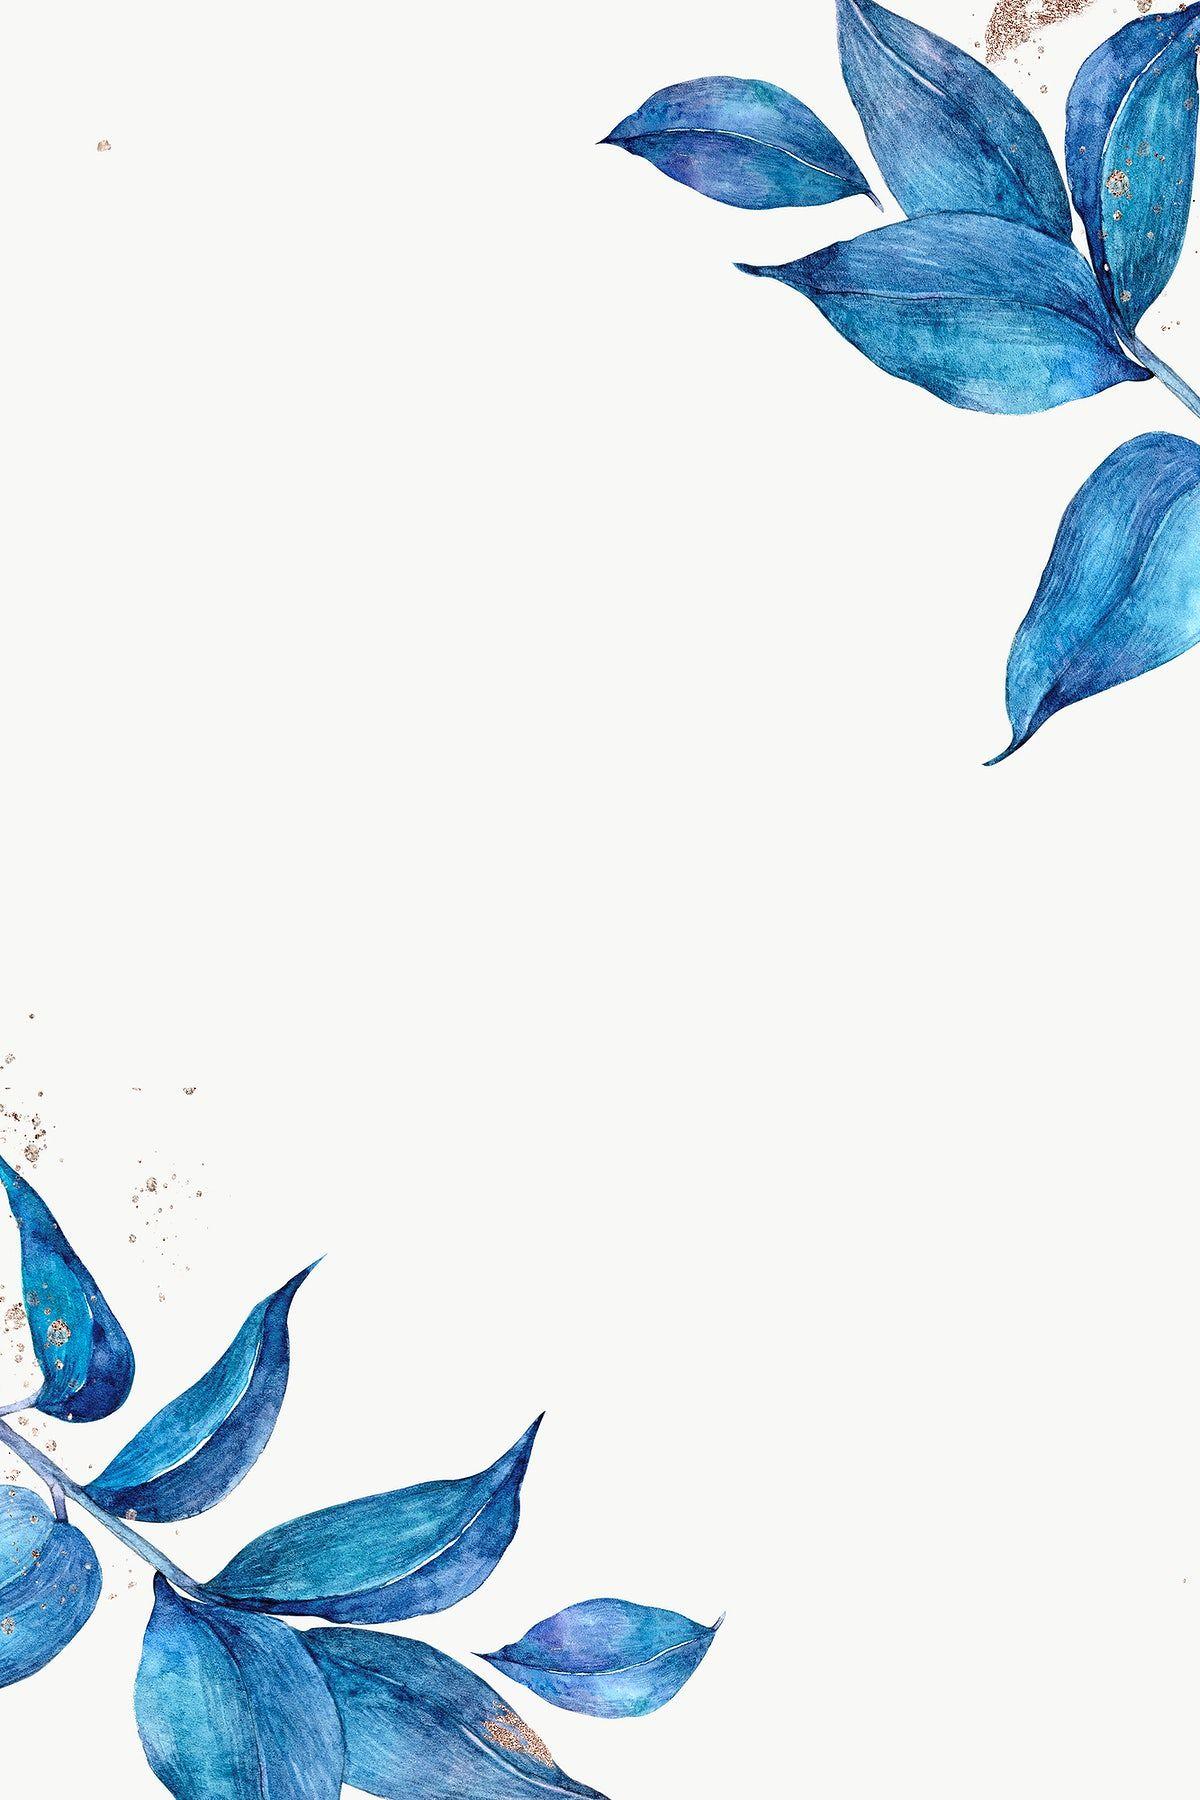 Download free png of PNG blue leaf frame botanical illustration by Adjima about blue leaf, Blue botanical leaf frame, watercolor plant template, blue watercolor design, and watercolour winter 2472968